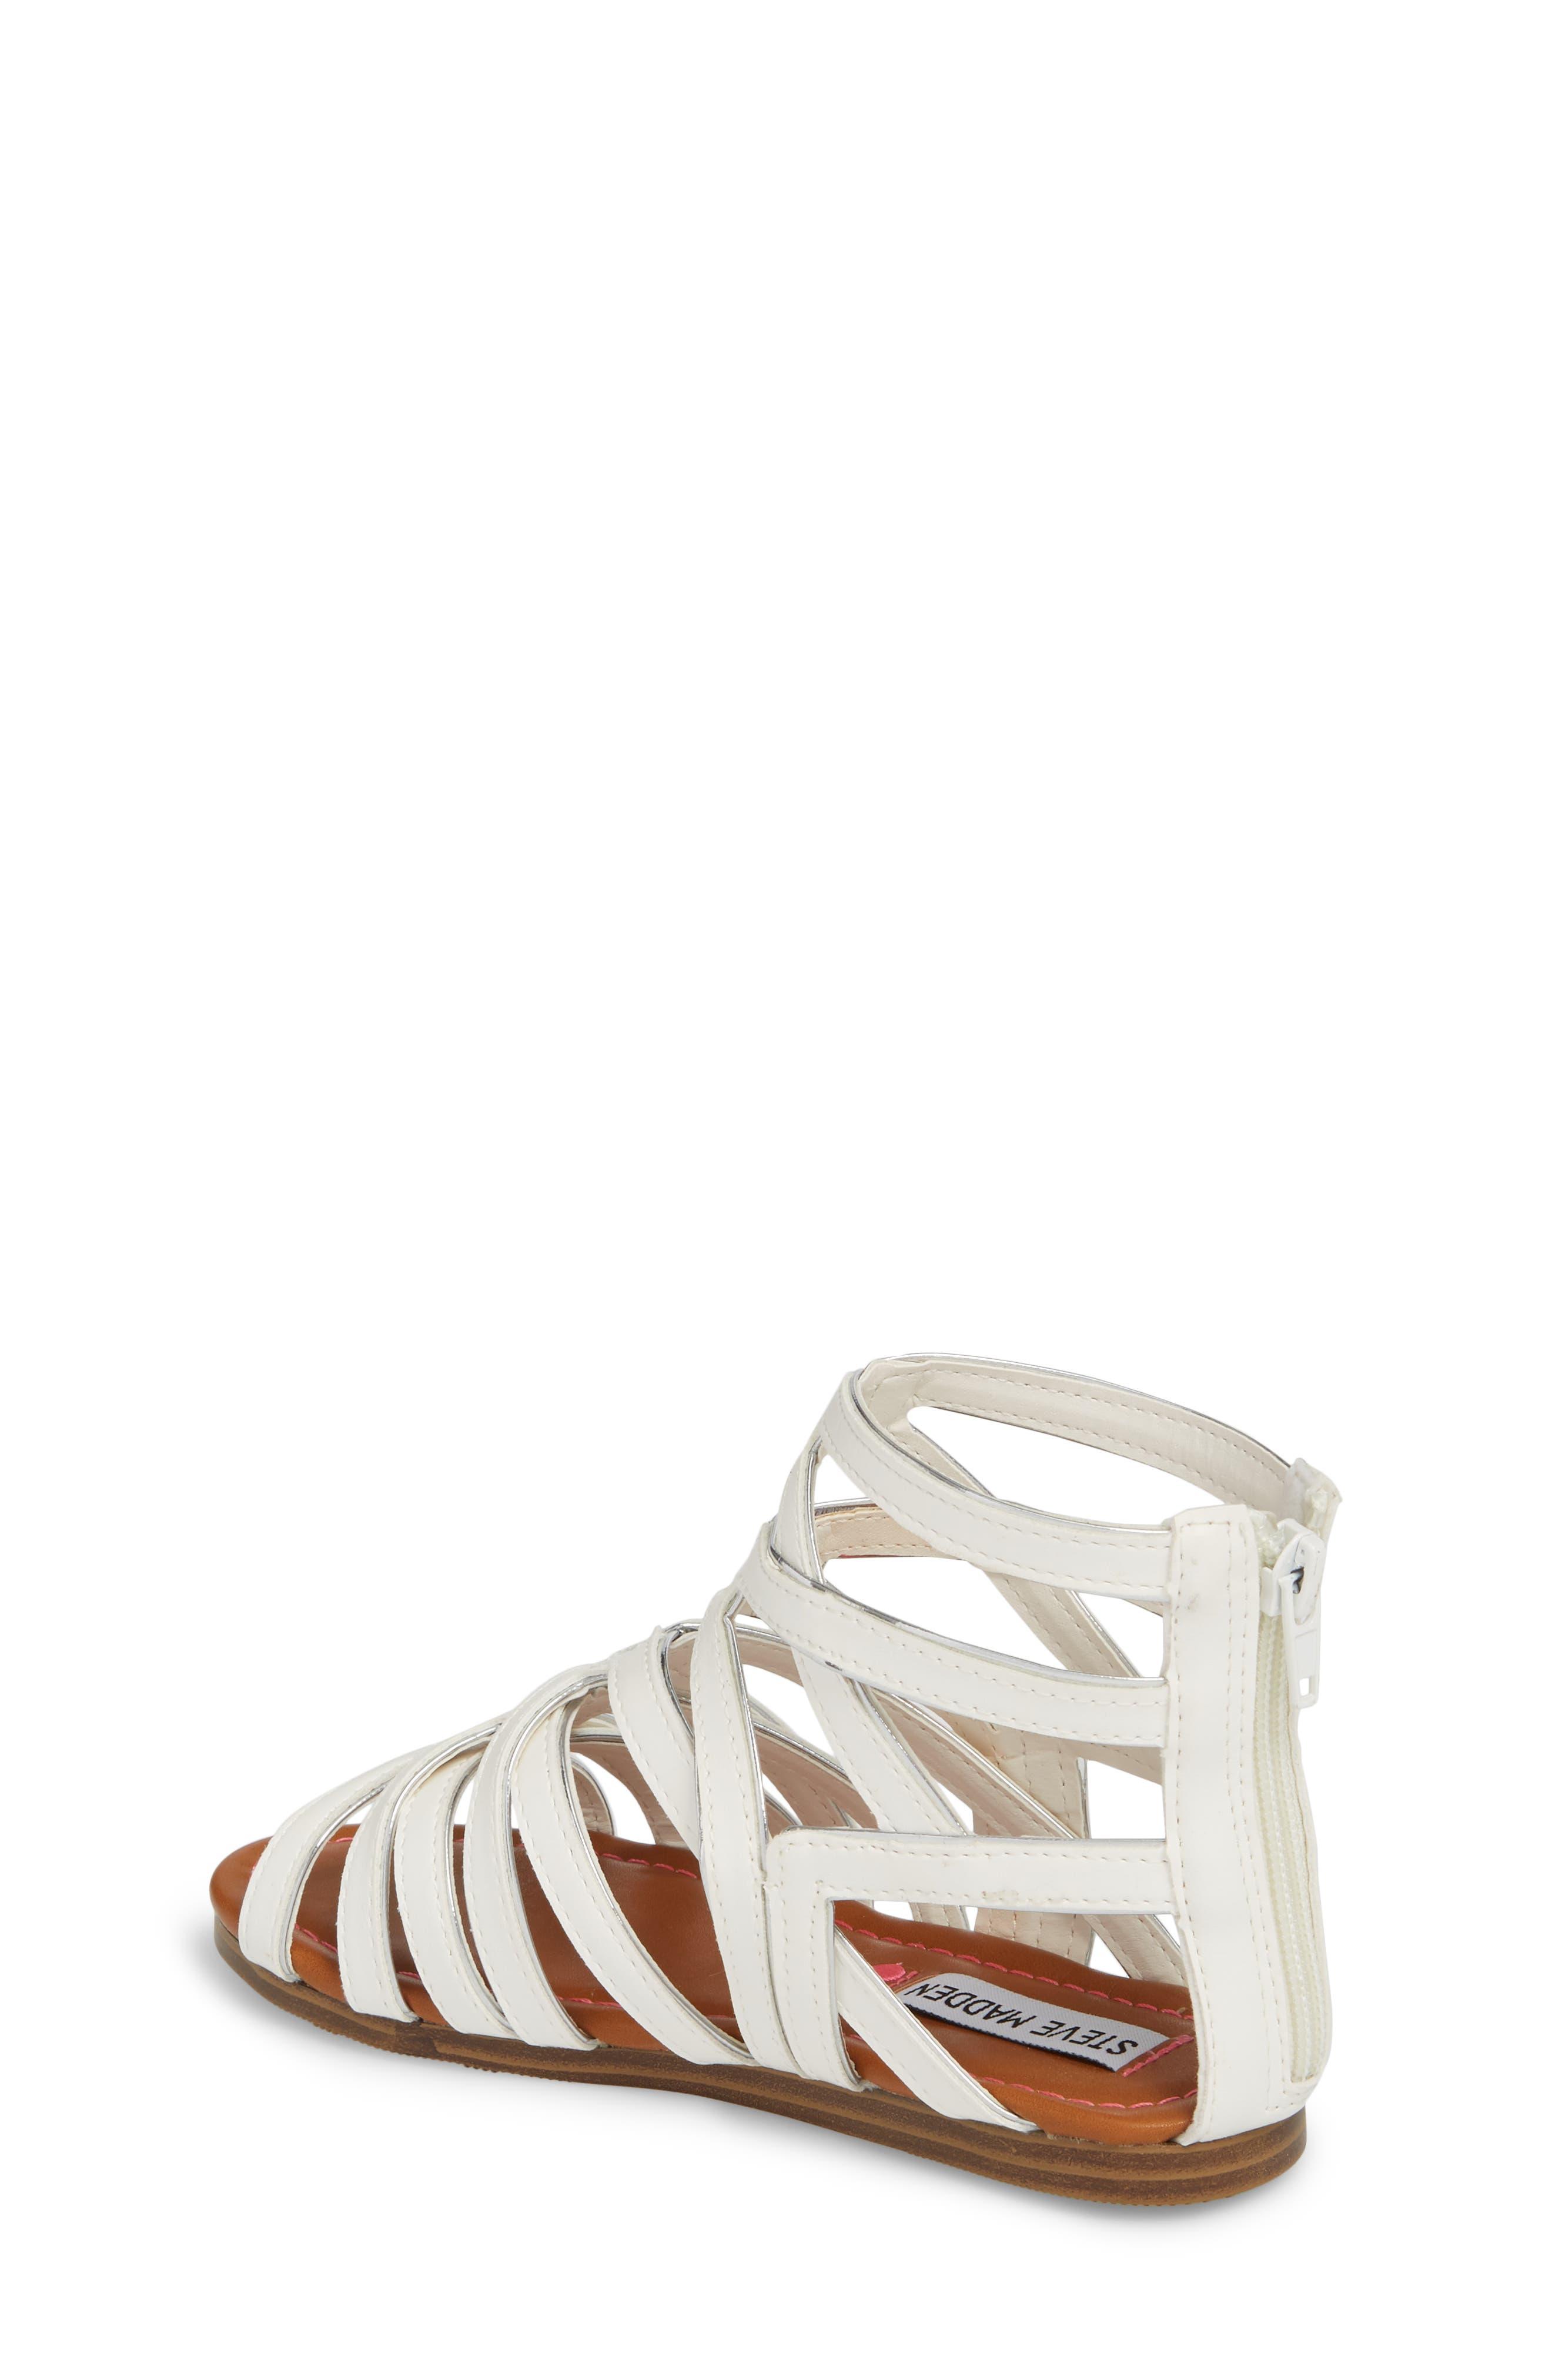 Jessence Gladiator Sandal,                             Alternate thumbnail 2, color,                             White